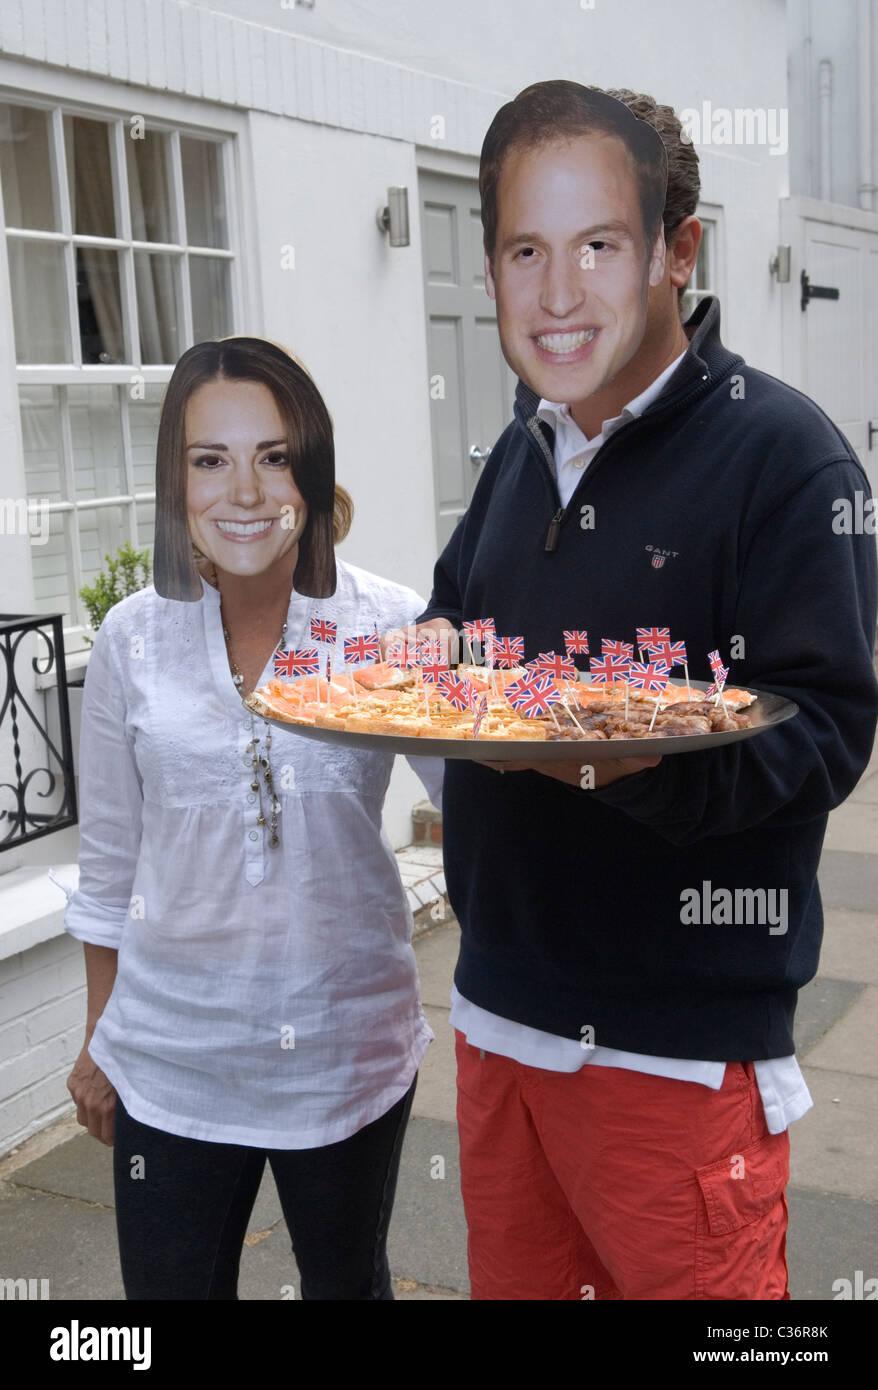 Royal Wedding Street Party. Chelsea London. Prince William and Princess Catherine  Kate Middleton souvenir masks. Stock Photo